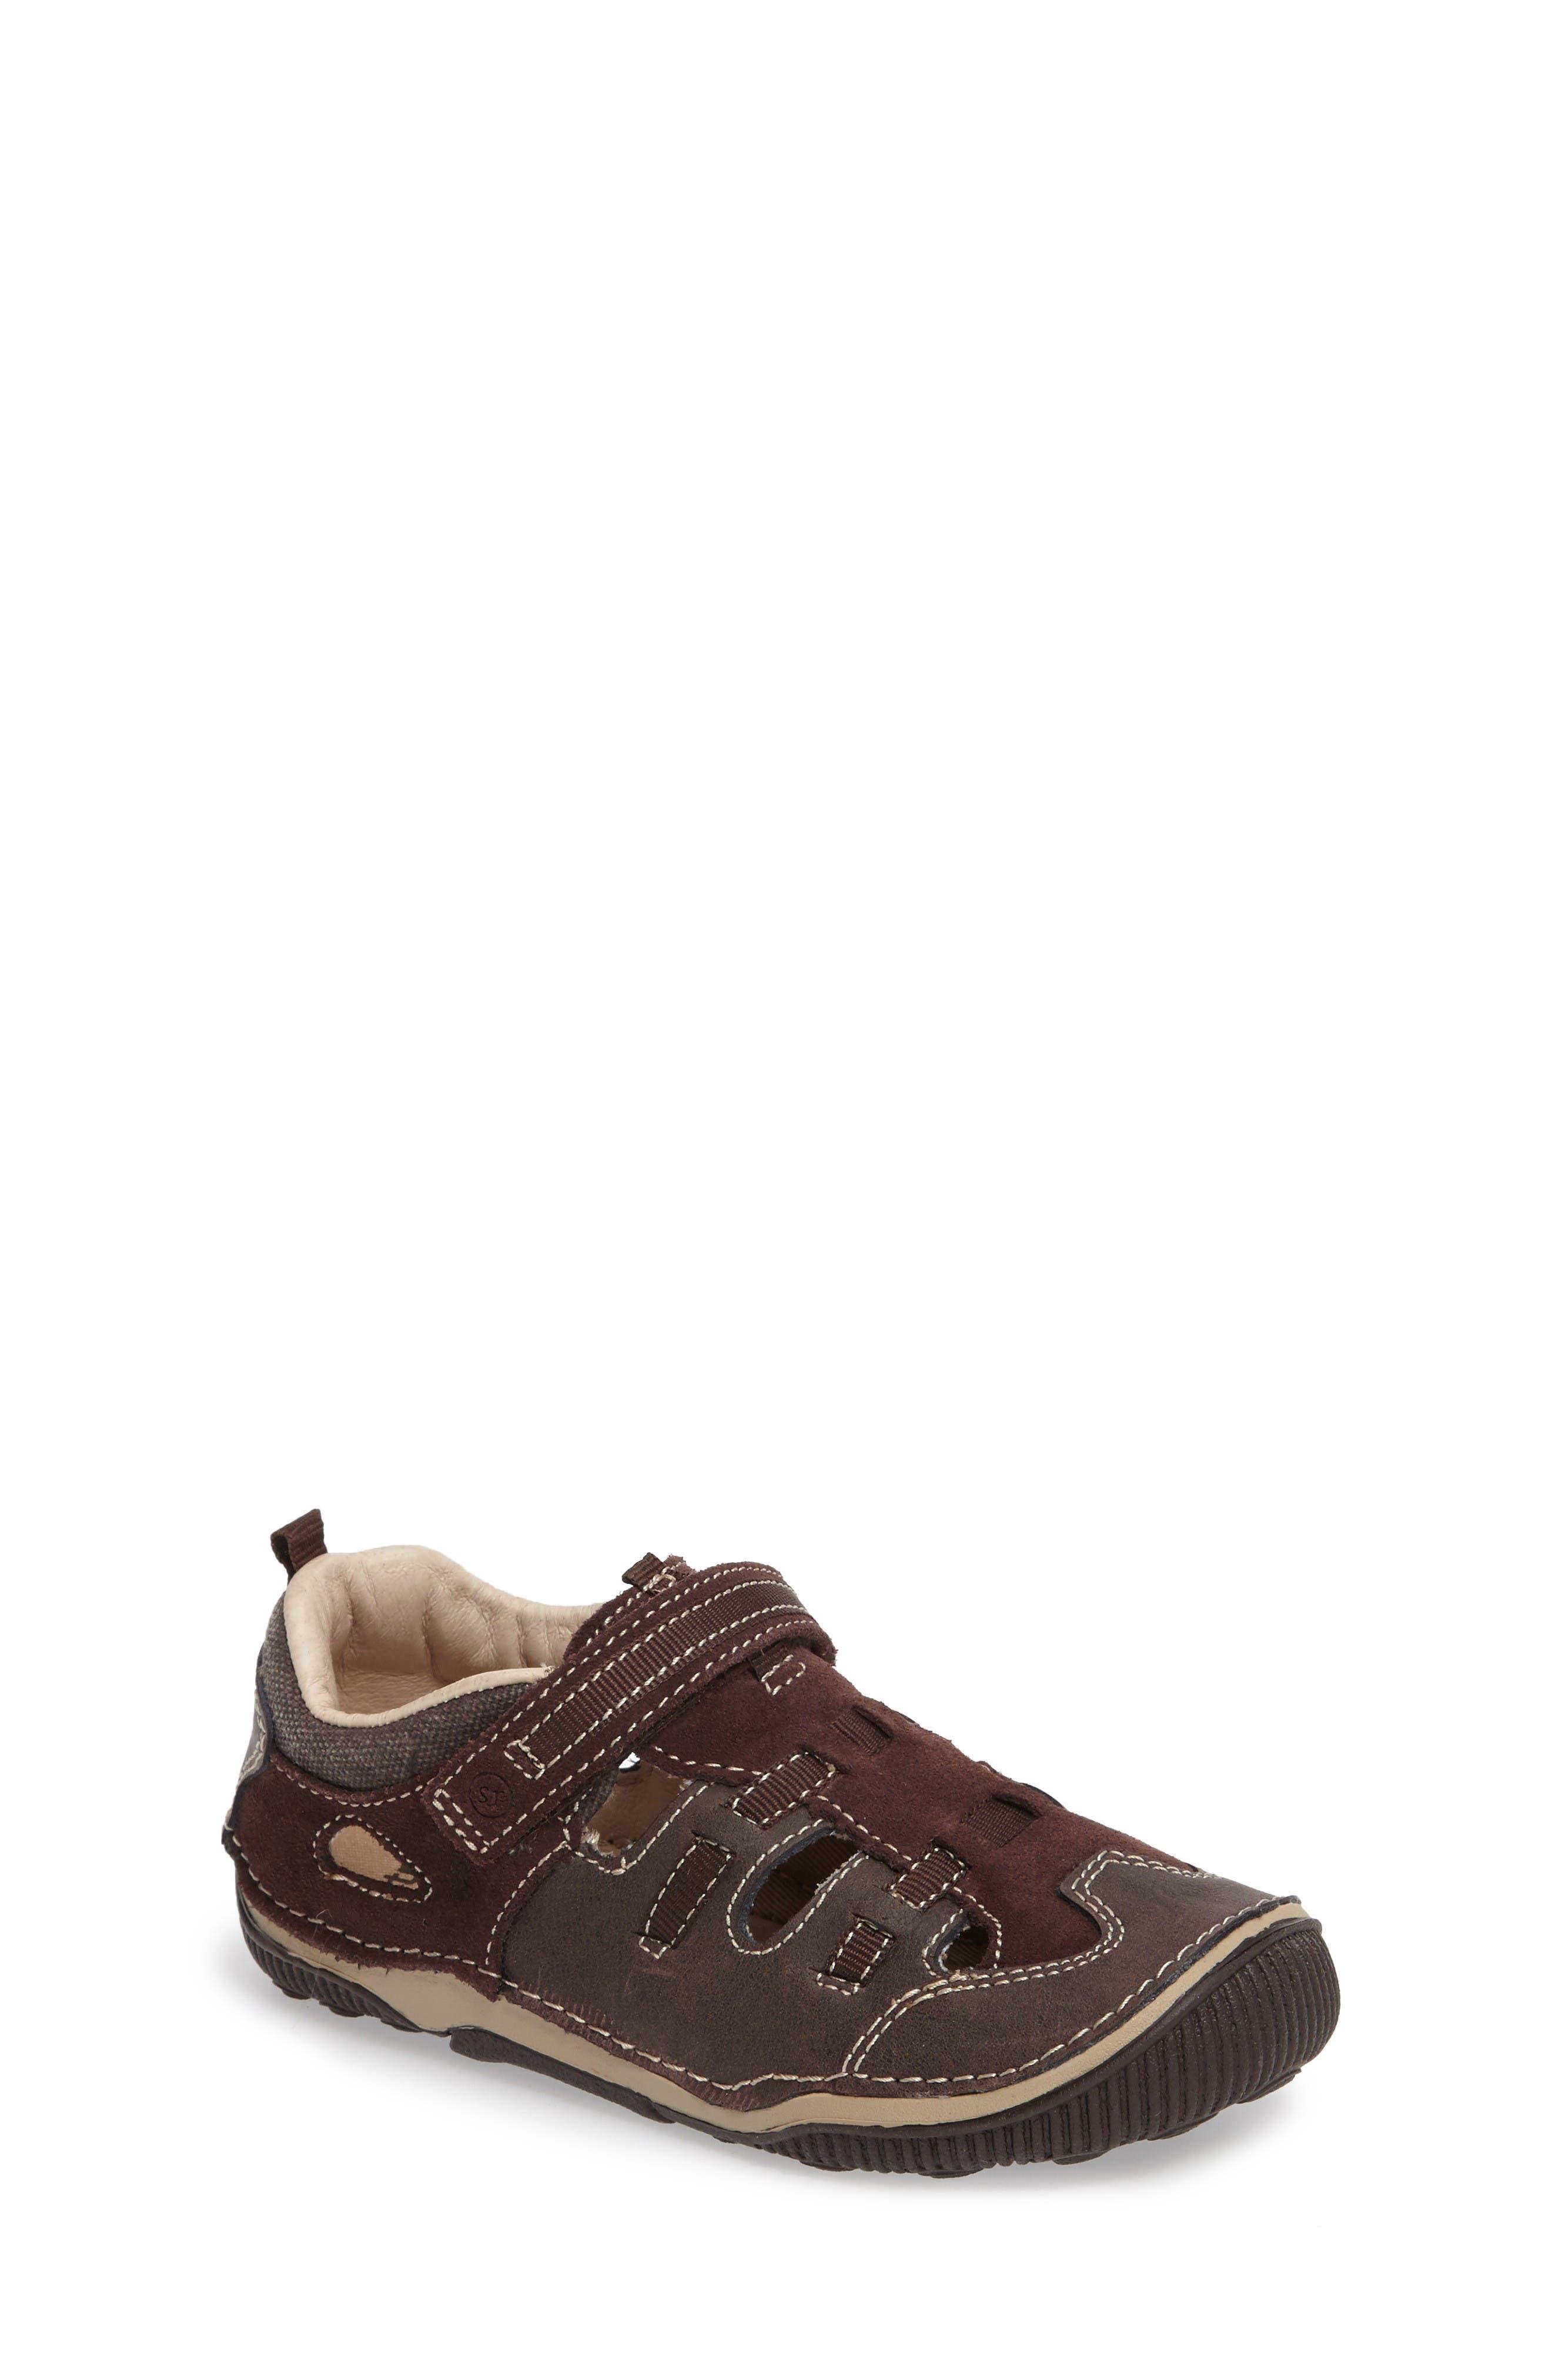 Reggie Cutout Sneaker,                         Main,                         color, Brown Leather